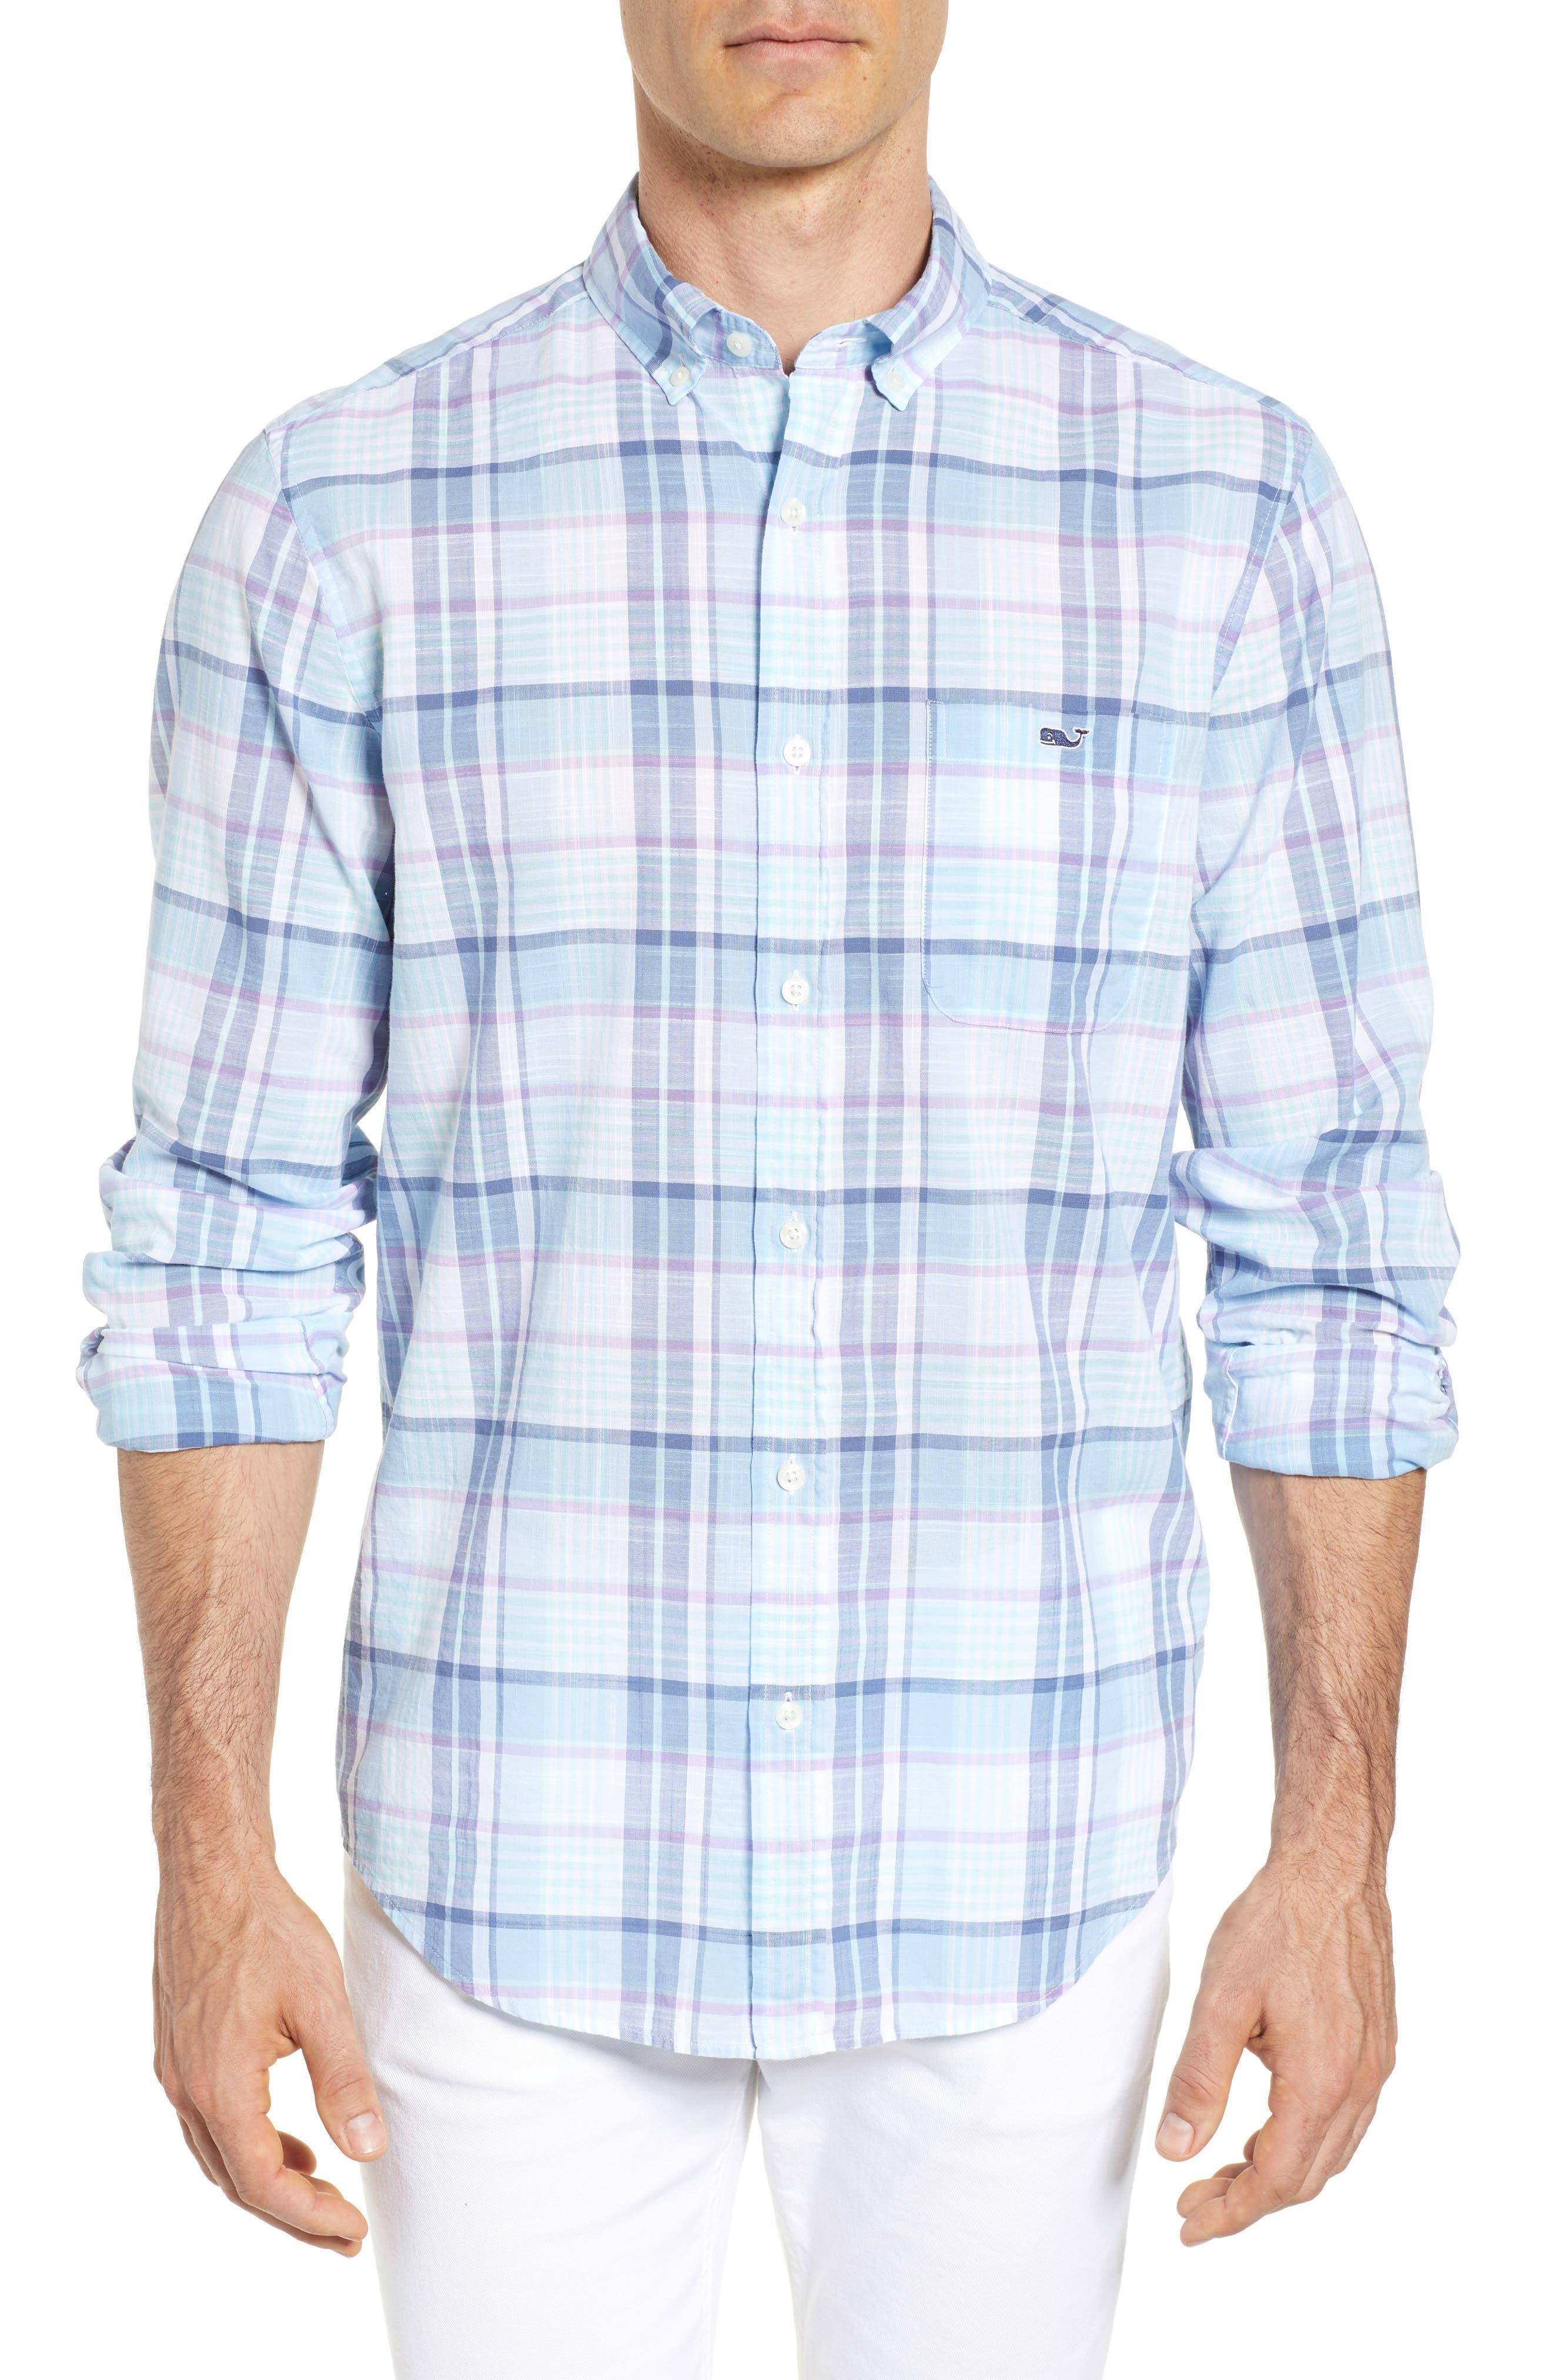 Pleasant Bay Classic Fit Plaid Sport Shirt,                             Main thumbnail 1, color,                             456